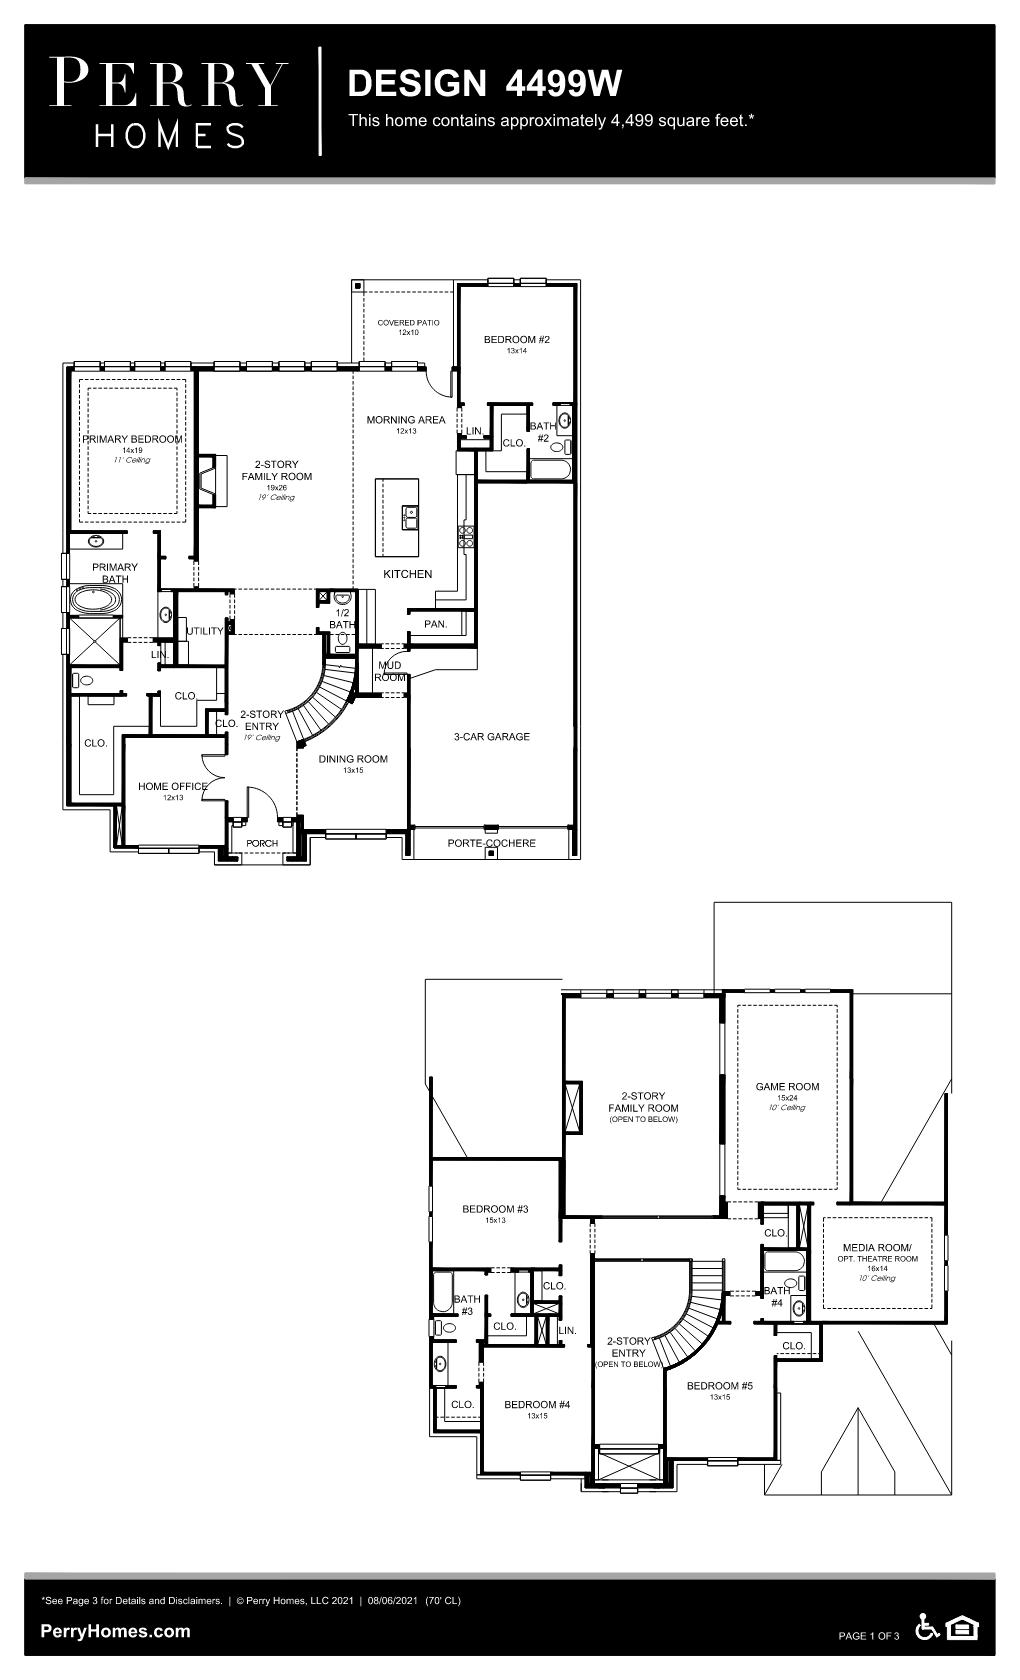 Floor Plan for 4499W